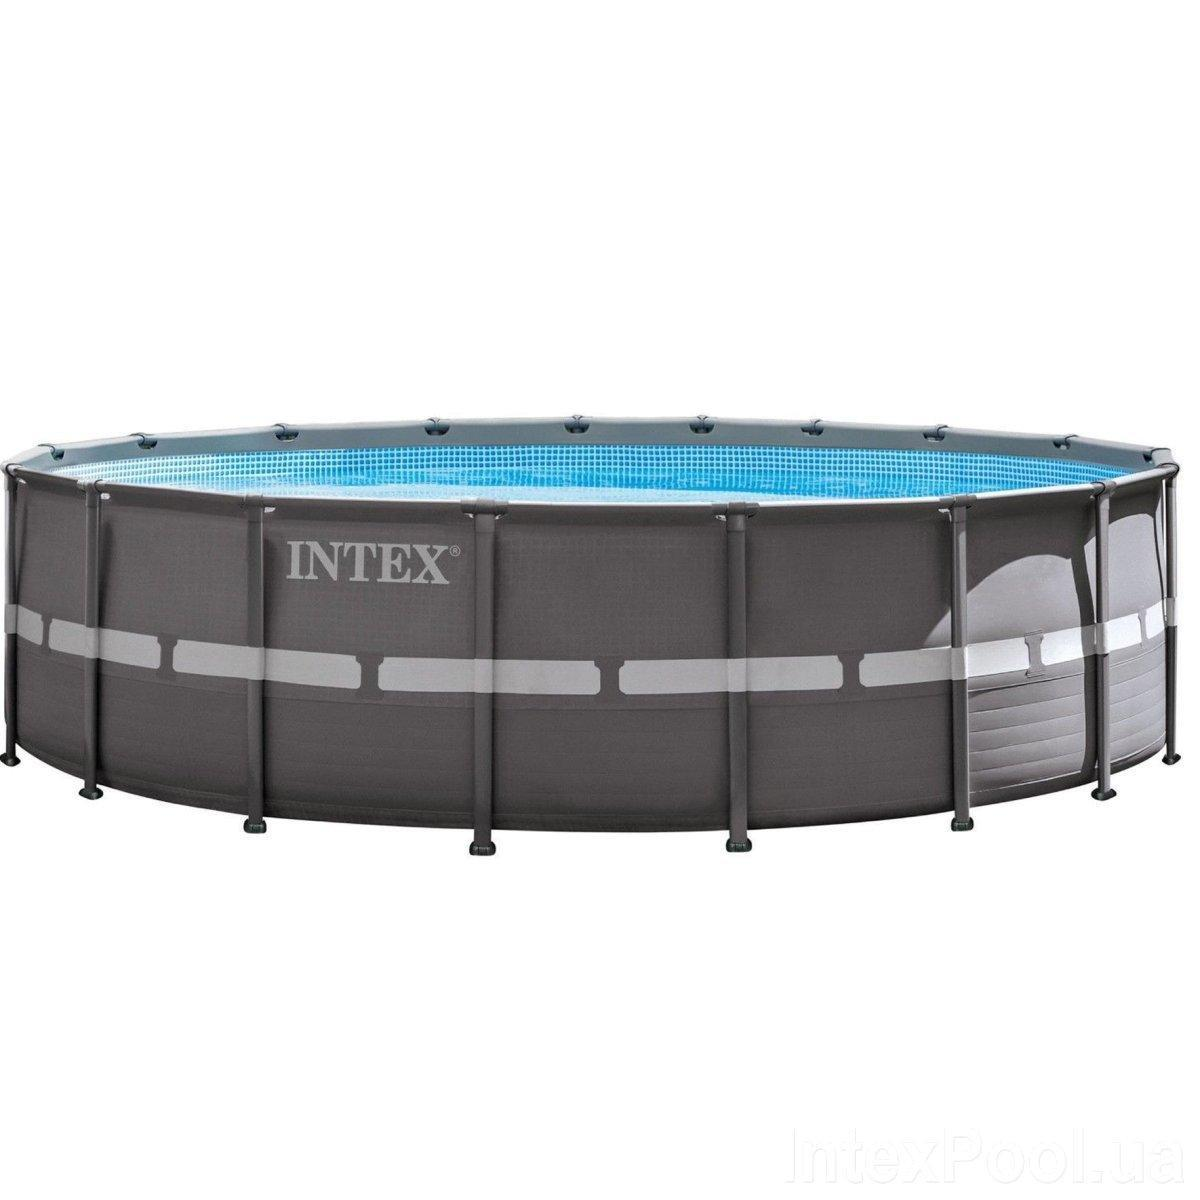 Каркасный бассейн Intex 26330 - 1, 549 х 132 см (лестница, тент, подстилка)